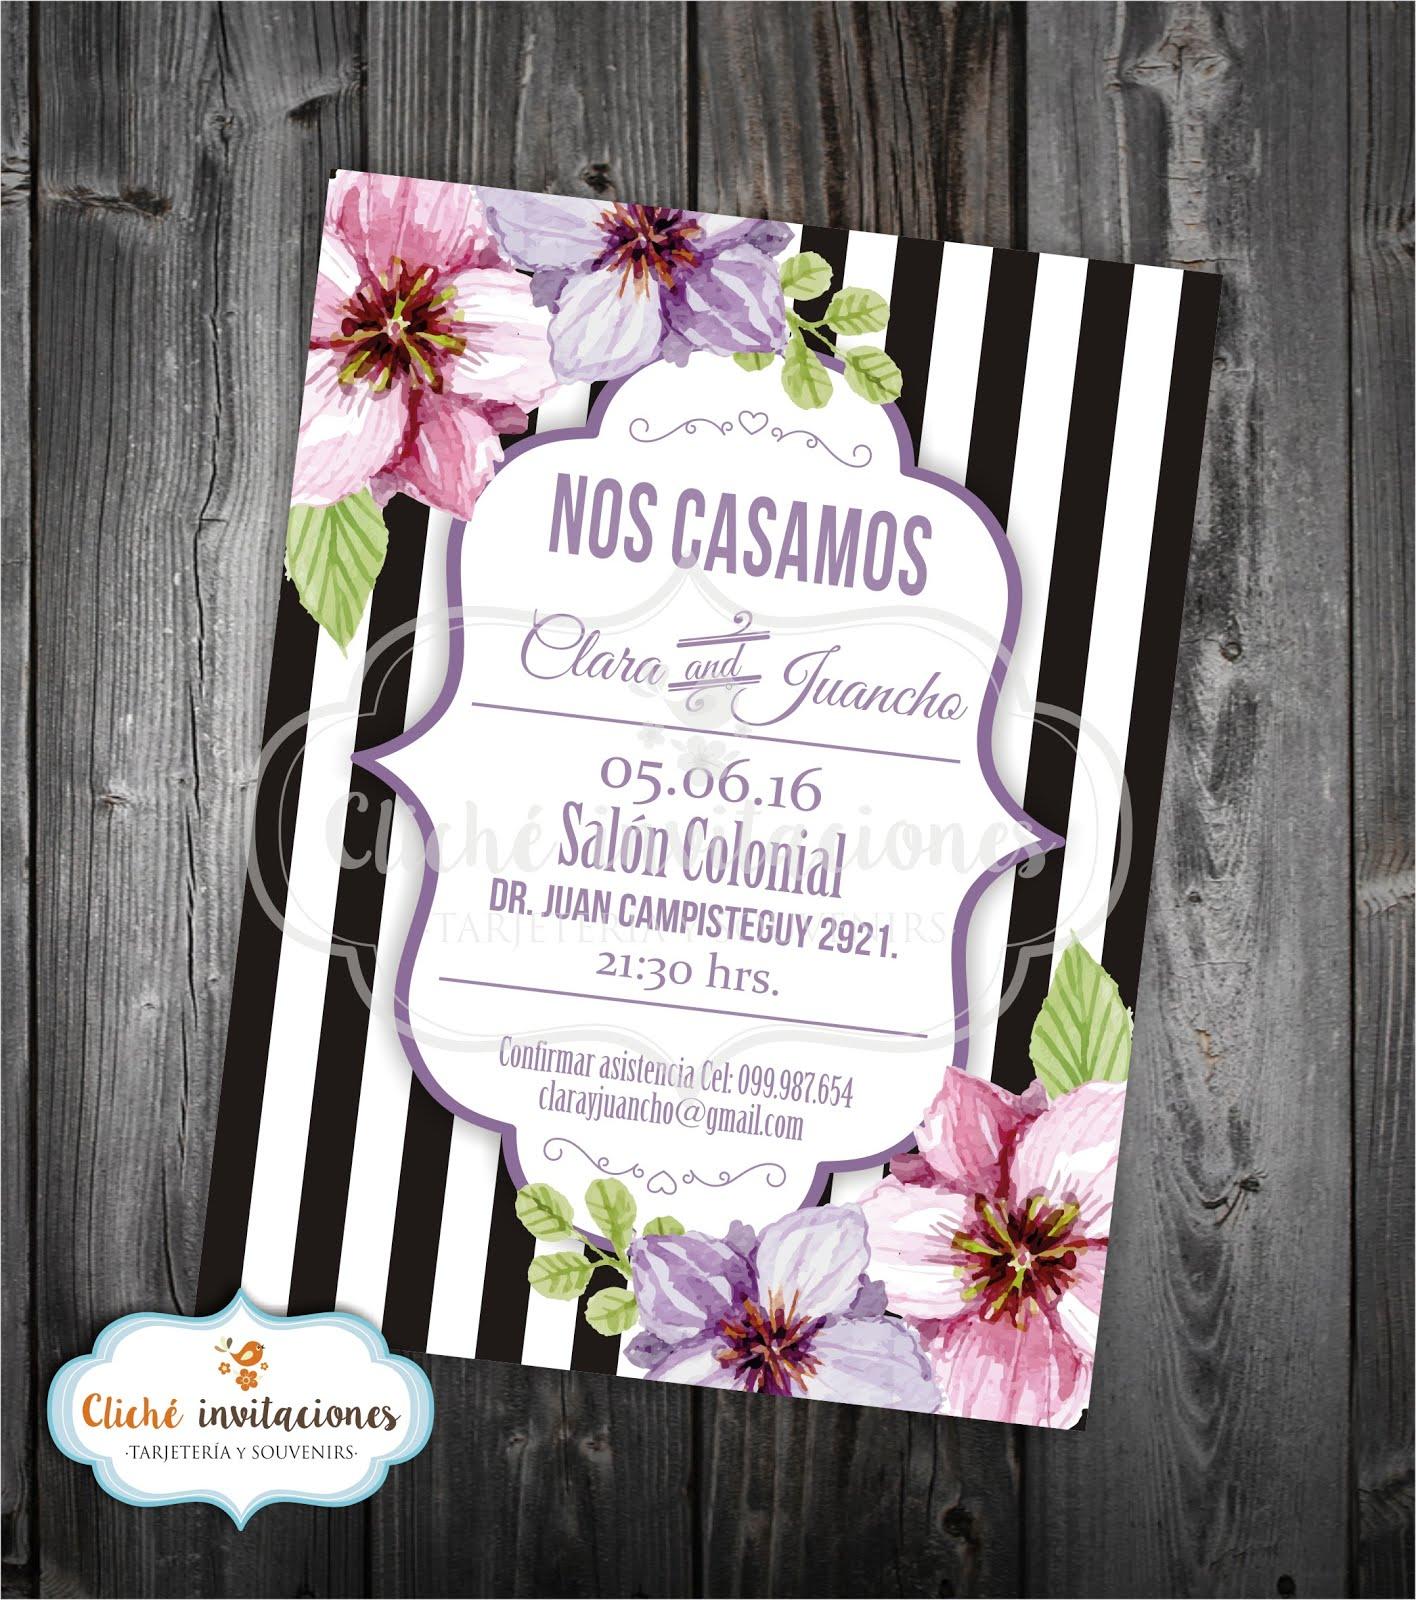 Cliche invitaciones tarjetas de cumplea os invitaciones - Modelos de tarjetas de boda ...